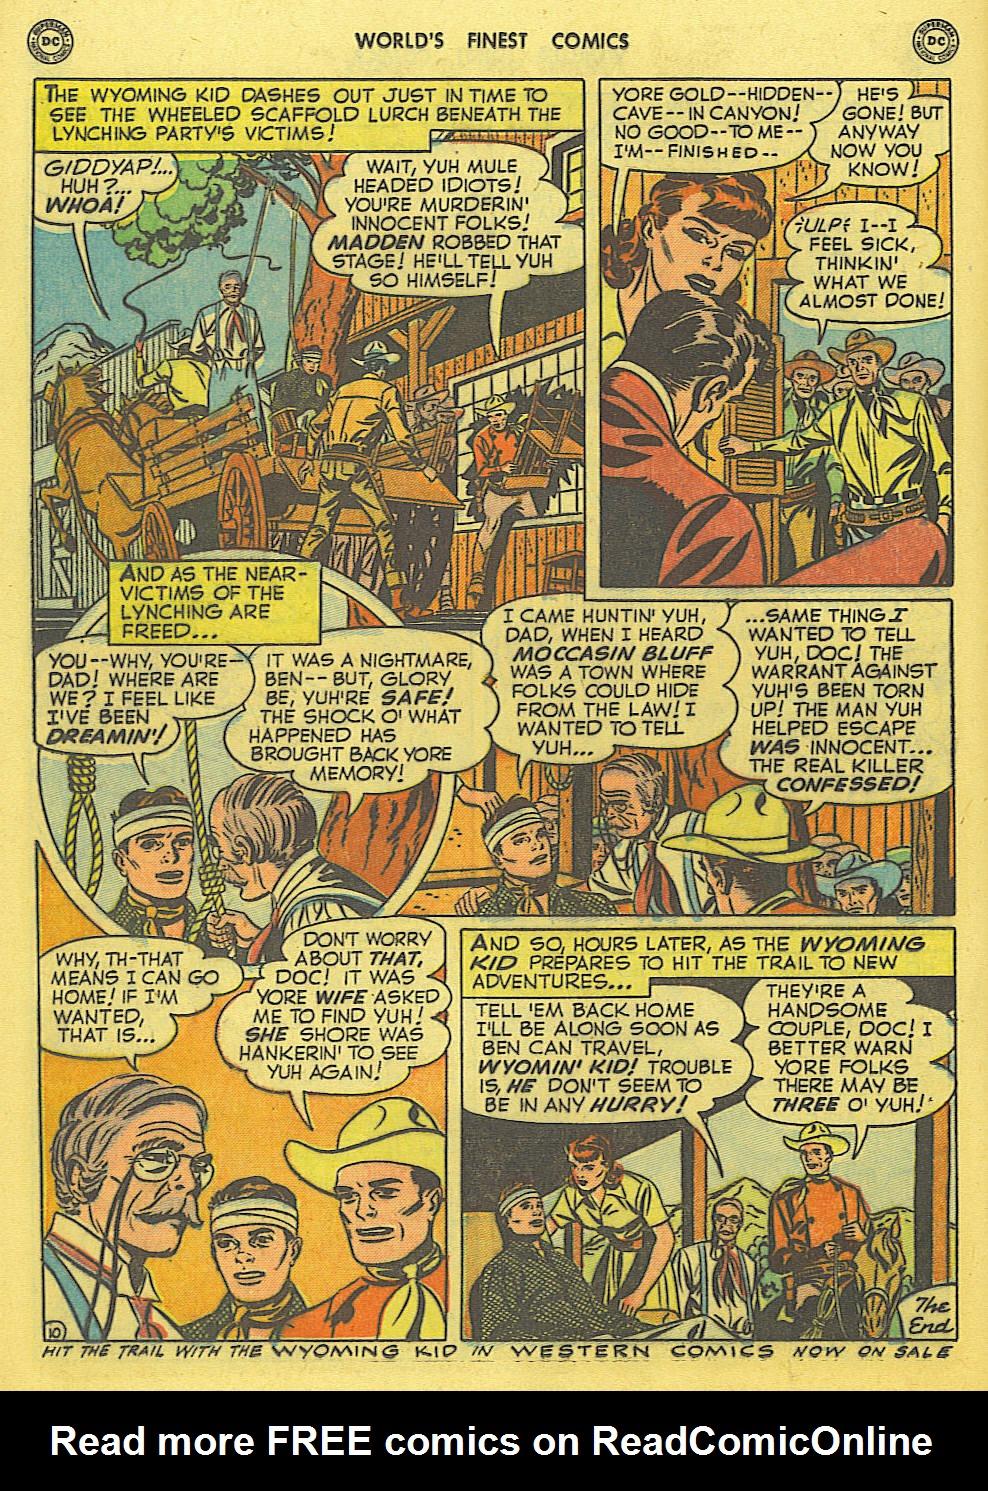 Read online World's Finest Comics comic -  Issue #49 - 49